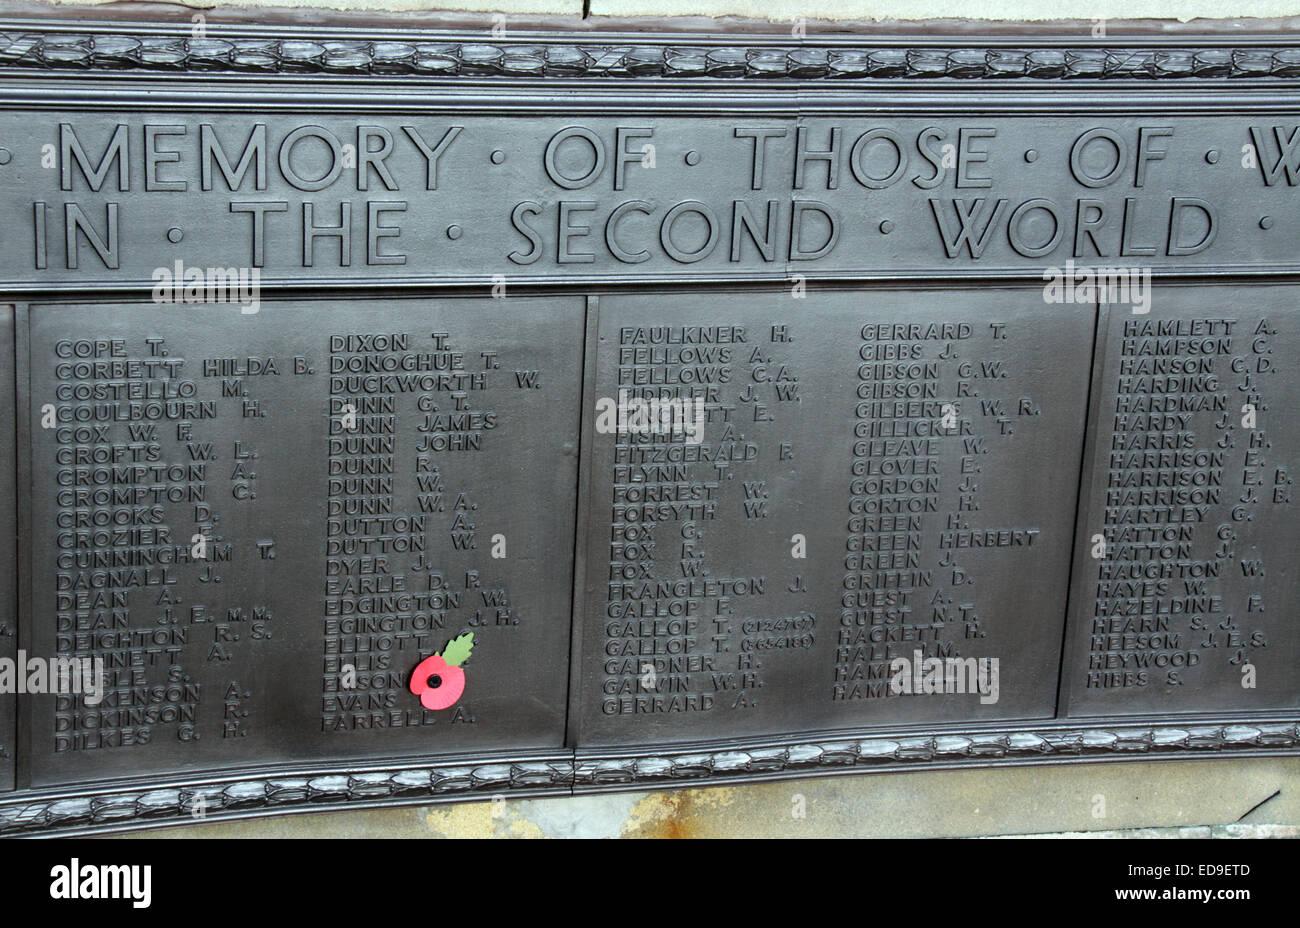 Laden Sie dieses Alamy Stockfoto Gedenktag & Poppy Warrington Kenotaph Nov 2014, Bridgefoot, Wilderspool Causeway, Cheshire, England, UK - ED9ETD